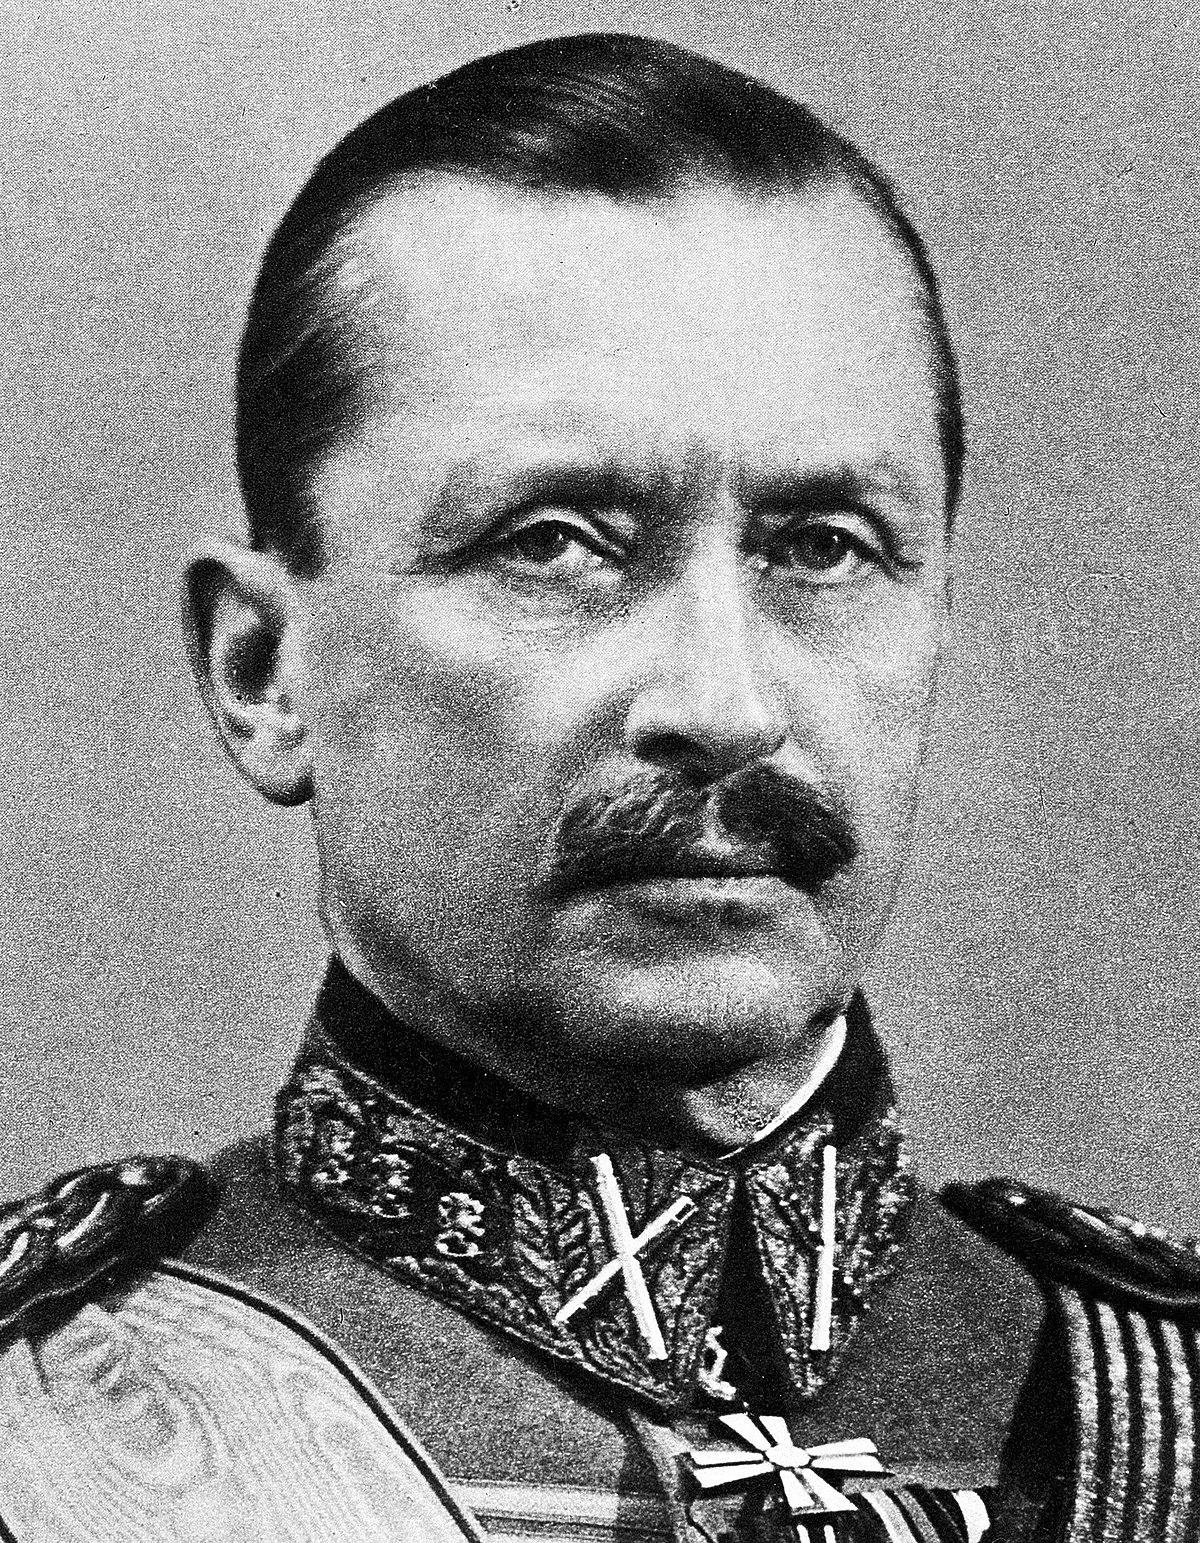 Carl Gustaf Emil Mannerheim 1940.jpg